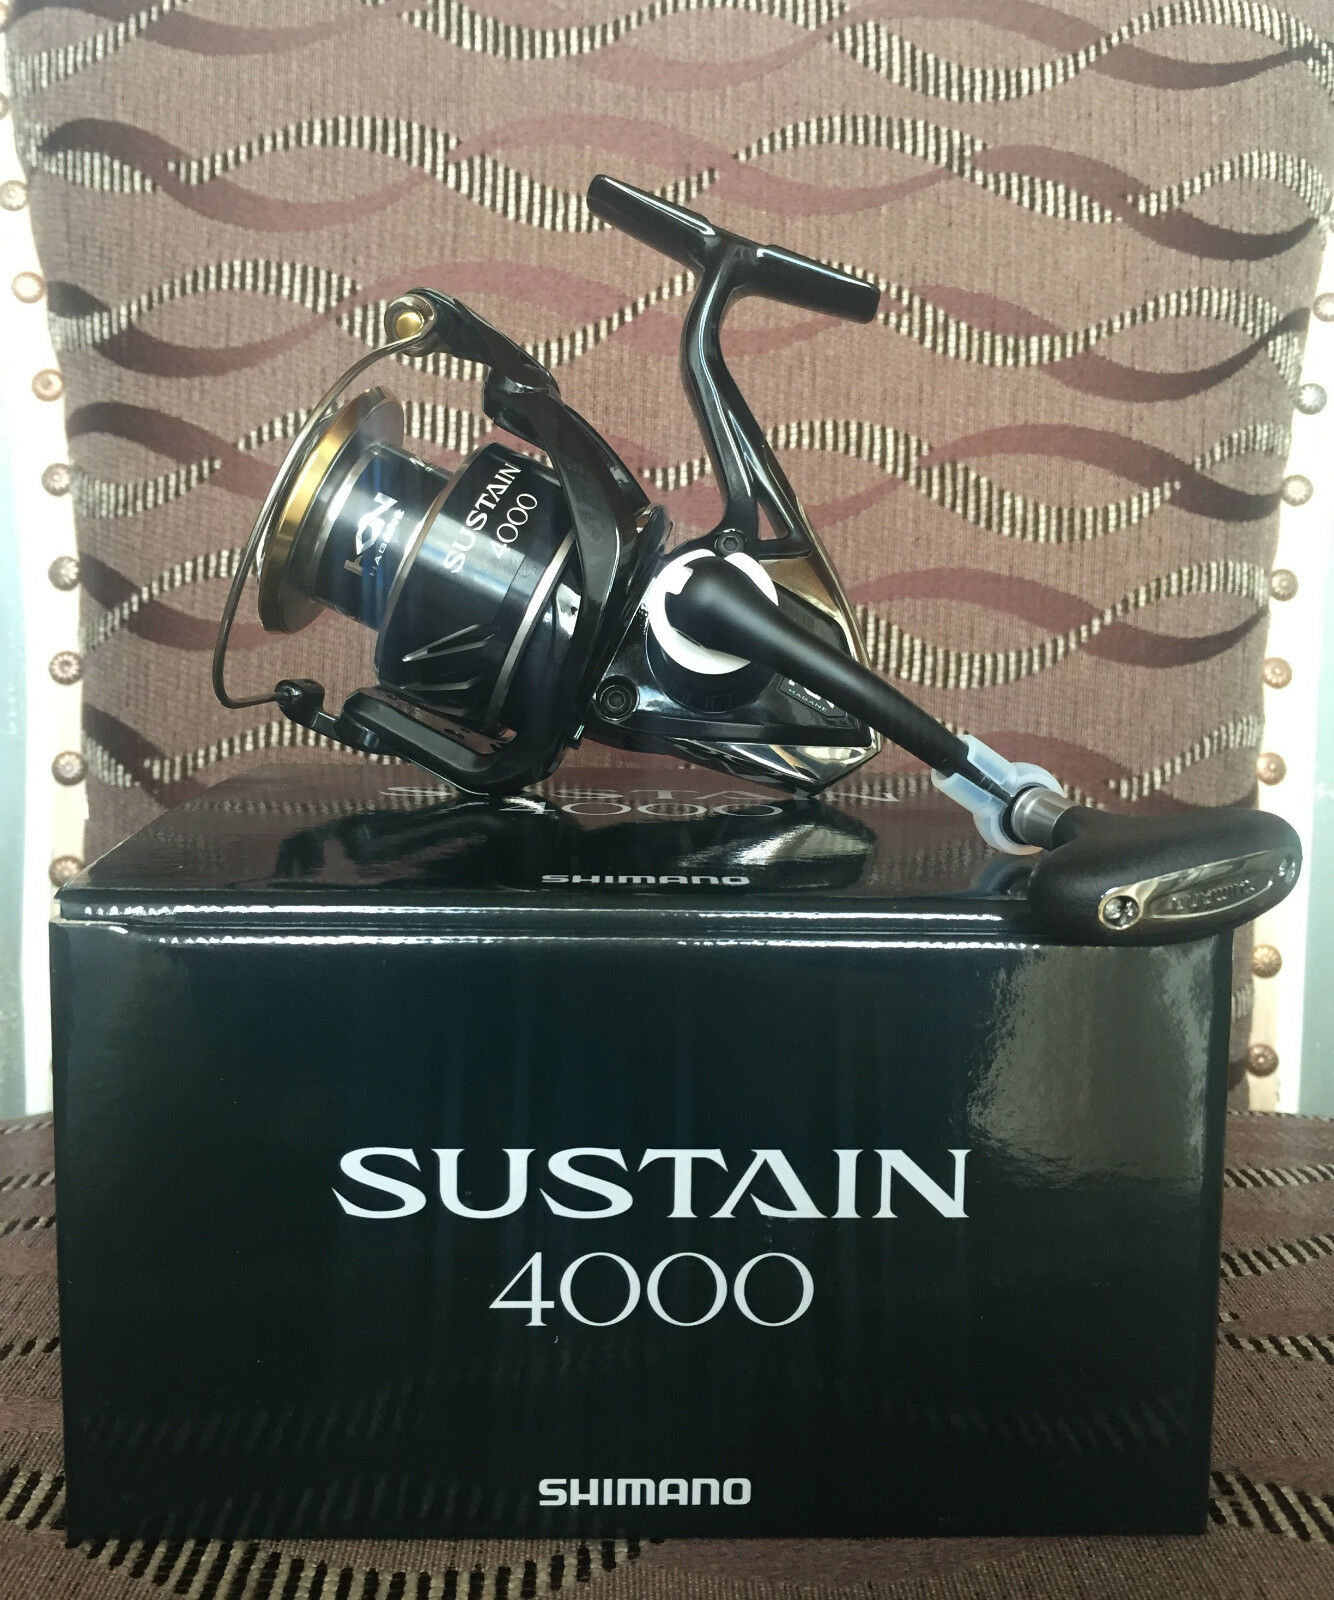 SHIMANO SUSTAIN 4000 fi spinnrolle